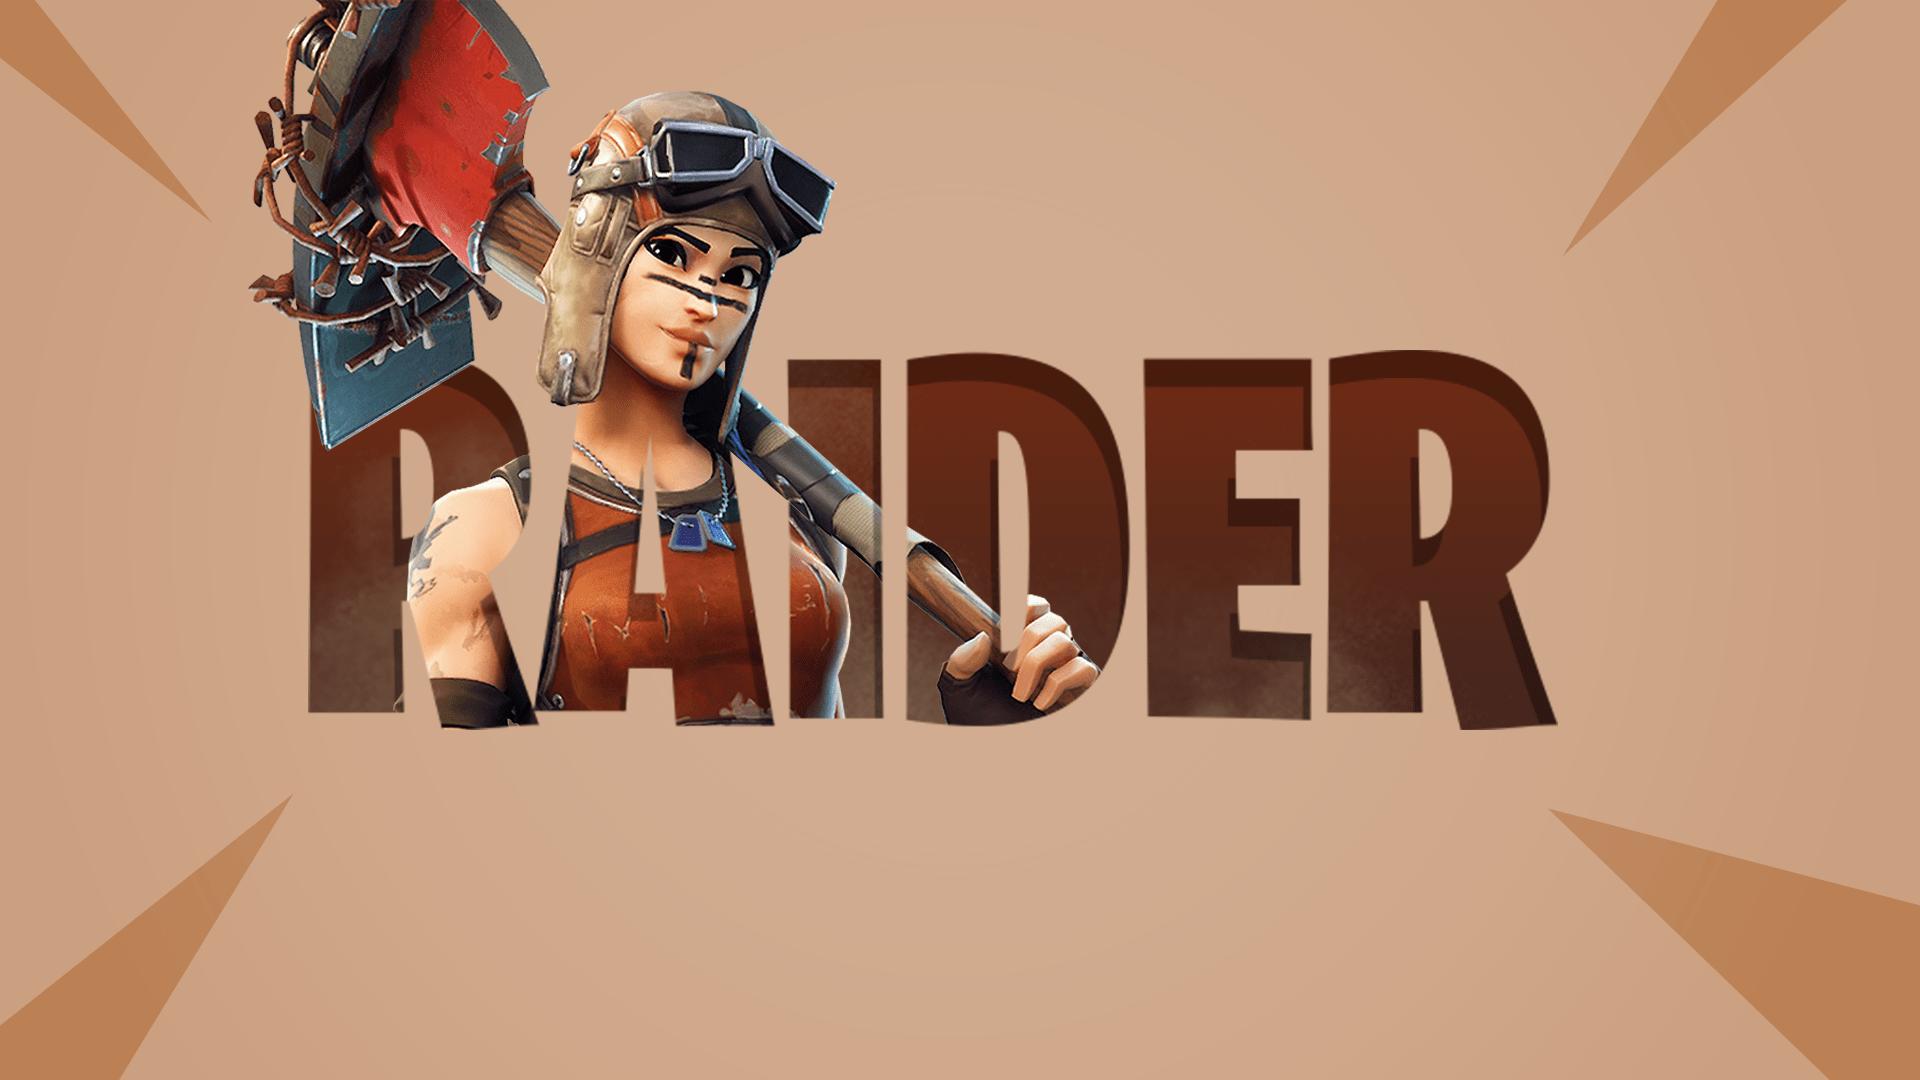 Renegade Raider Wallpapers Top Free Renegade Raider Backgrounds Wallpaperaccess